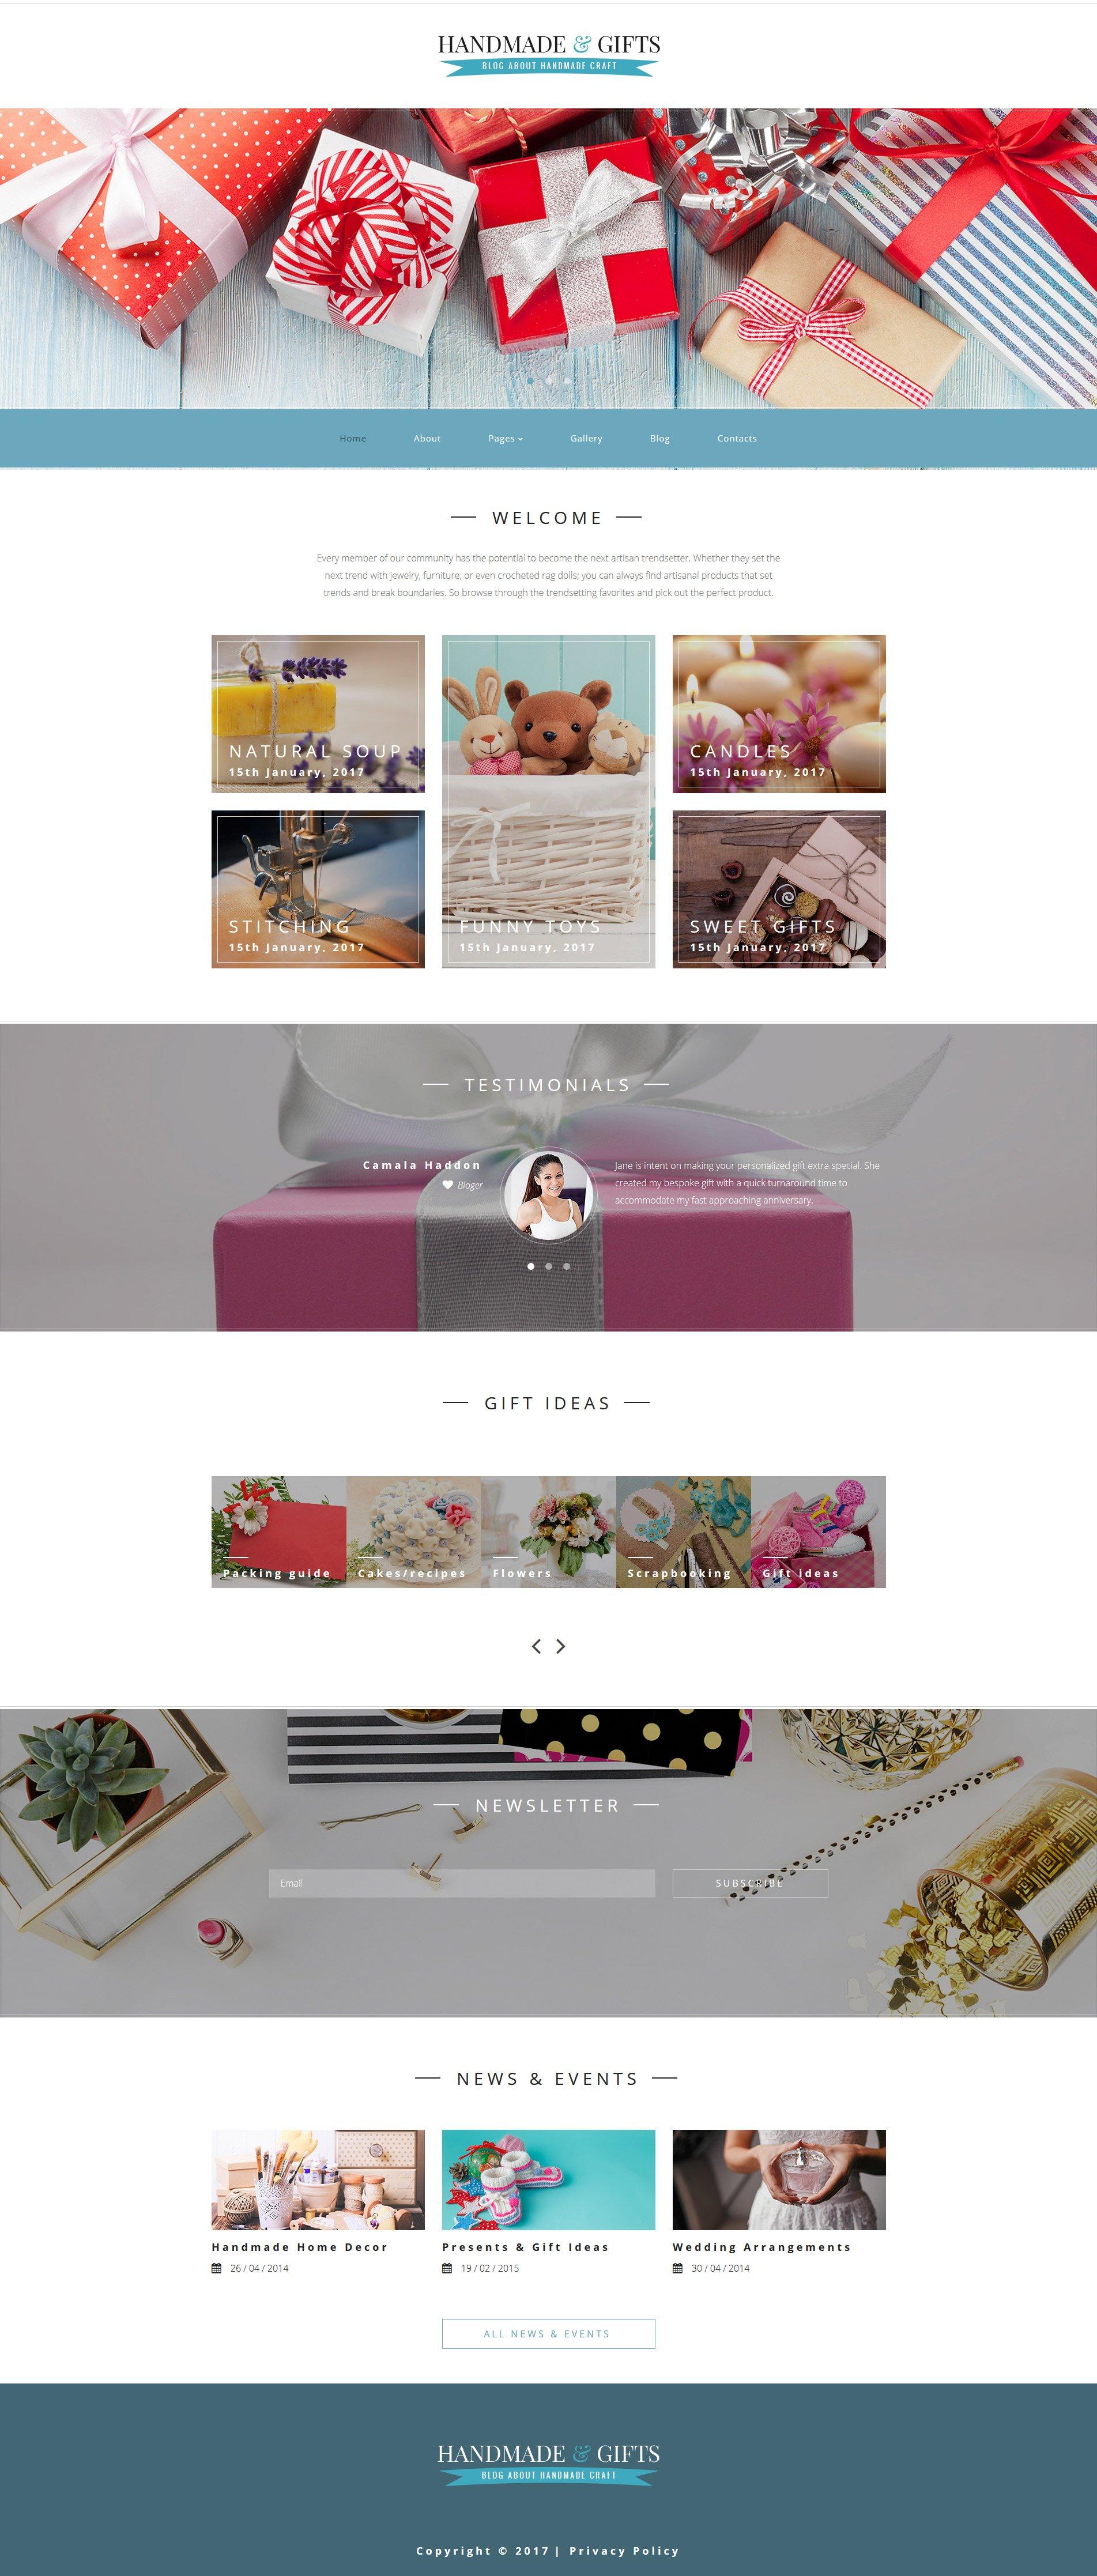 """Handmade & Gifts - Crafts Blog and Gift Store"" - адаптивний Joomla шаблон №62277 - скріншот"